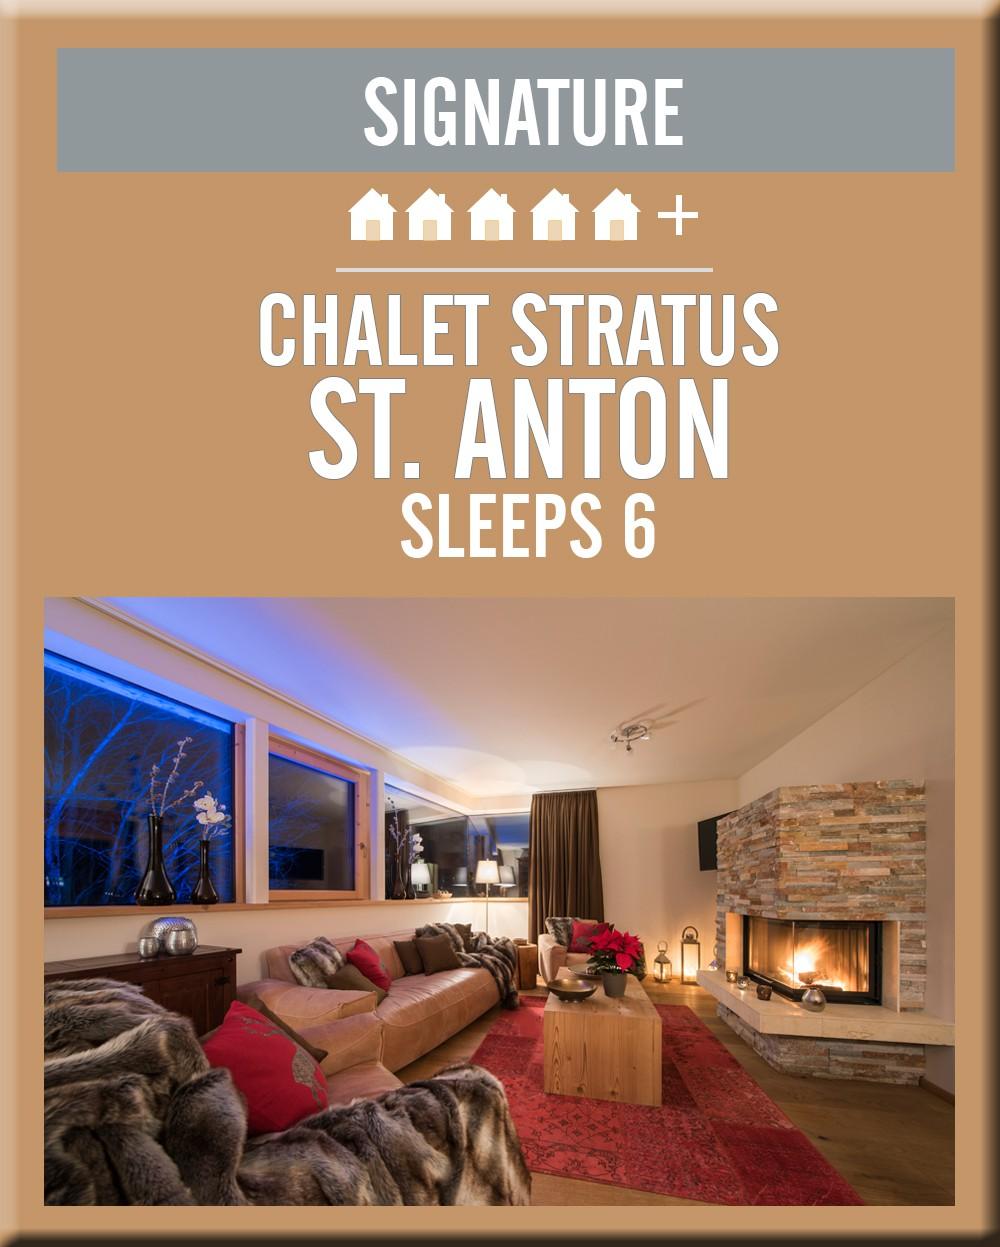 Austria chalet stratus st anton lounge area